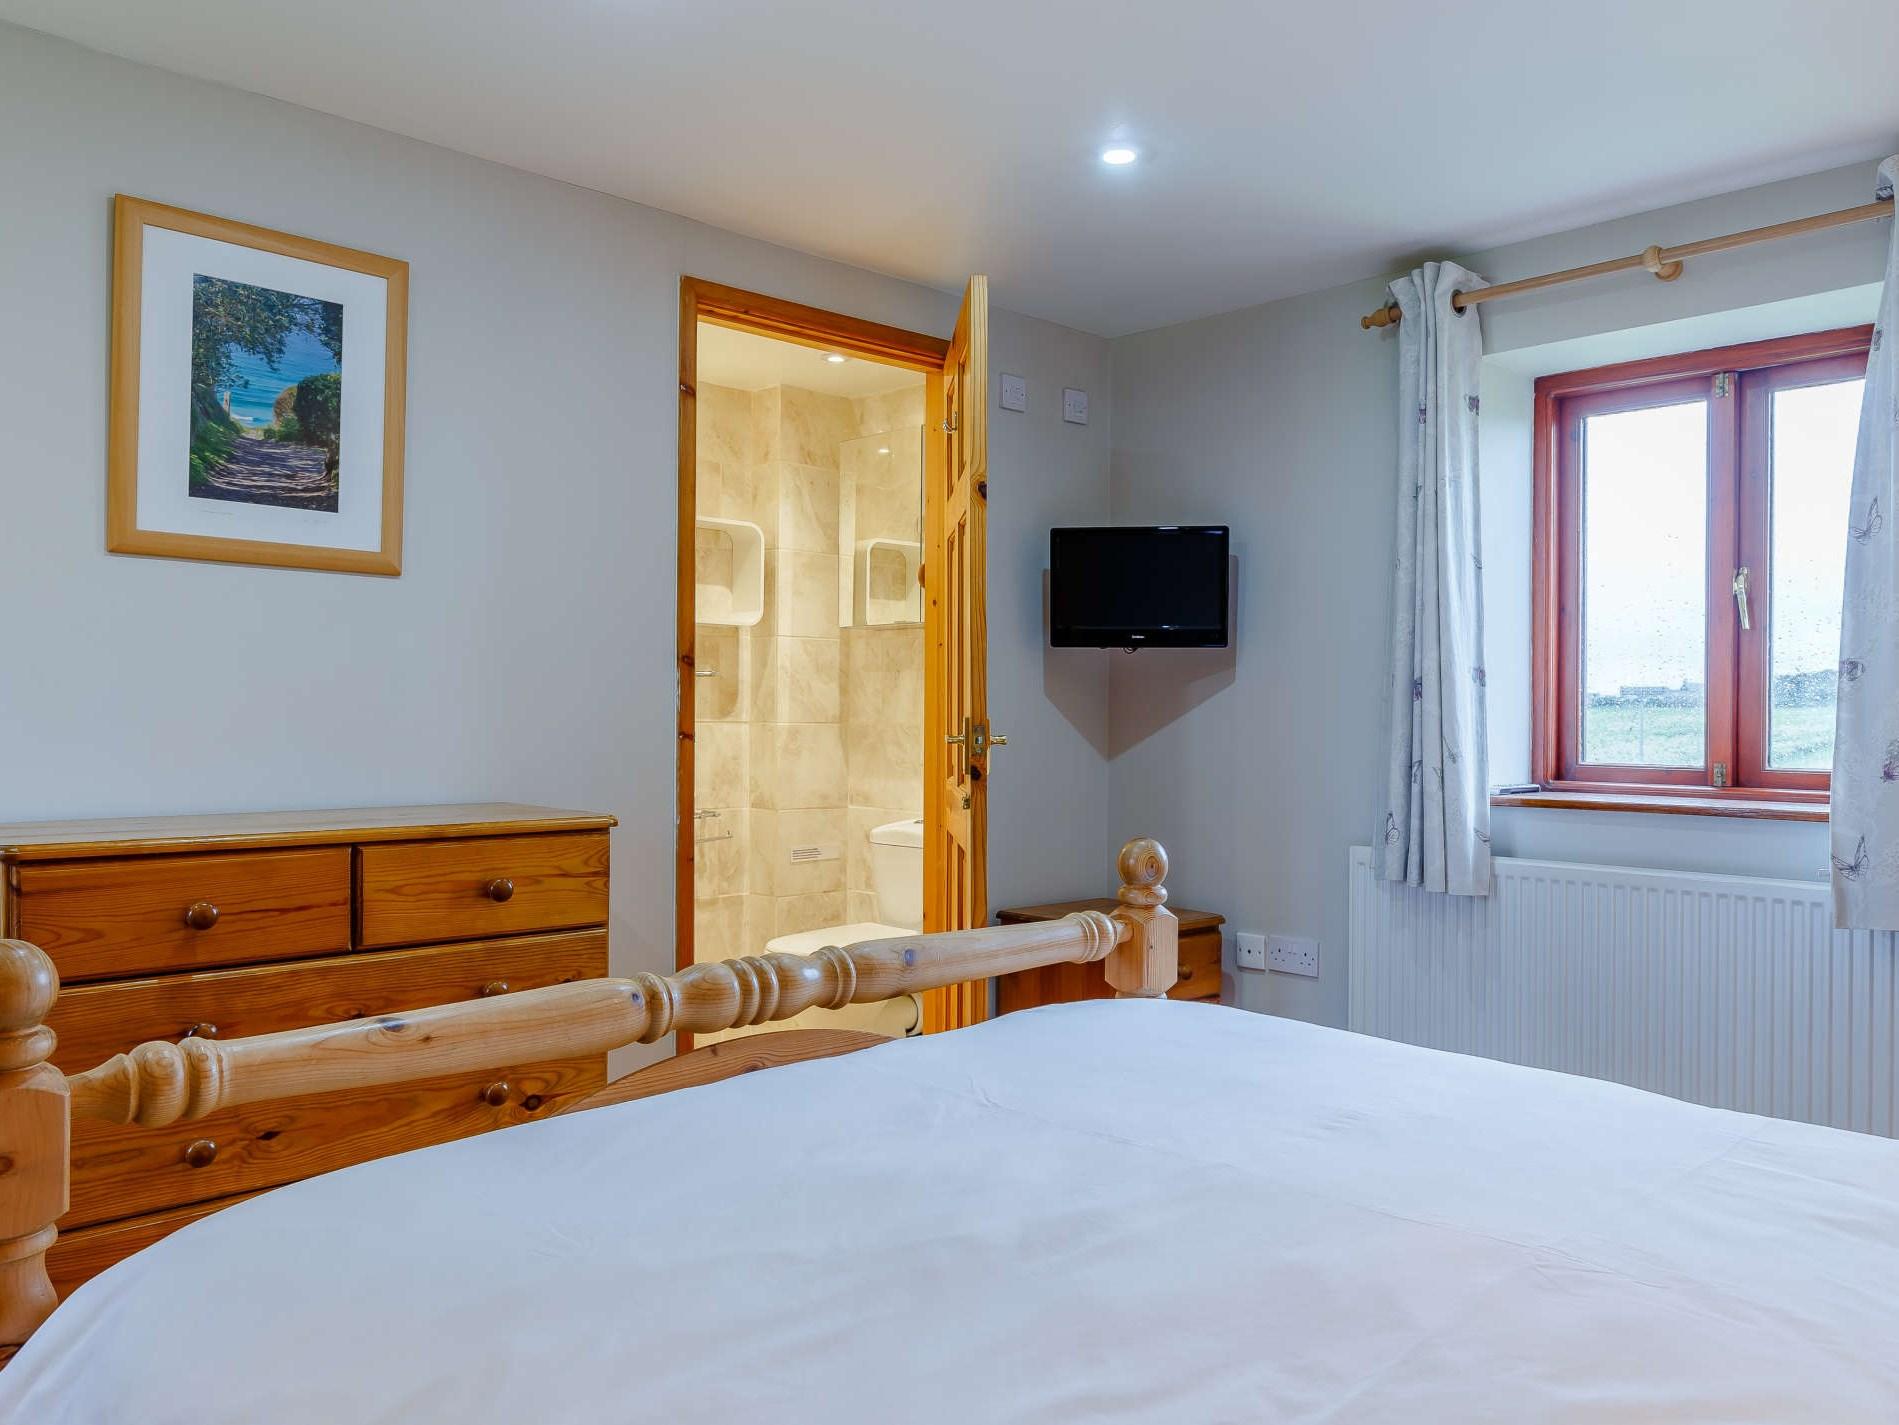 3 Bedroom Barn in West Cornwall, Cornwall